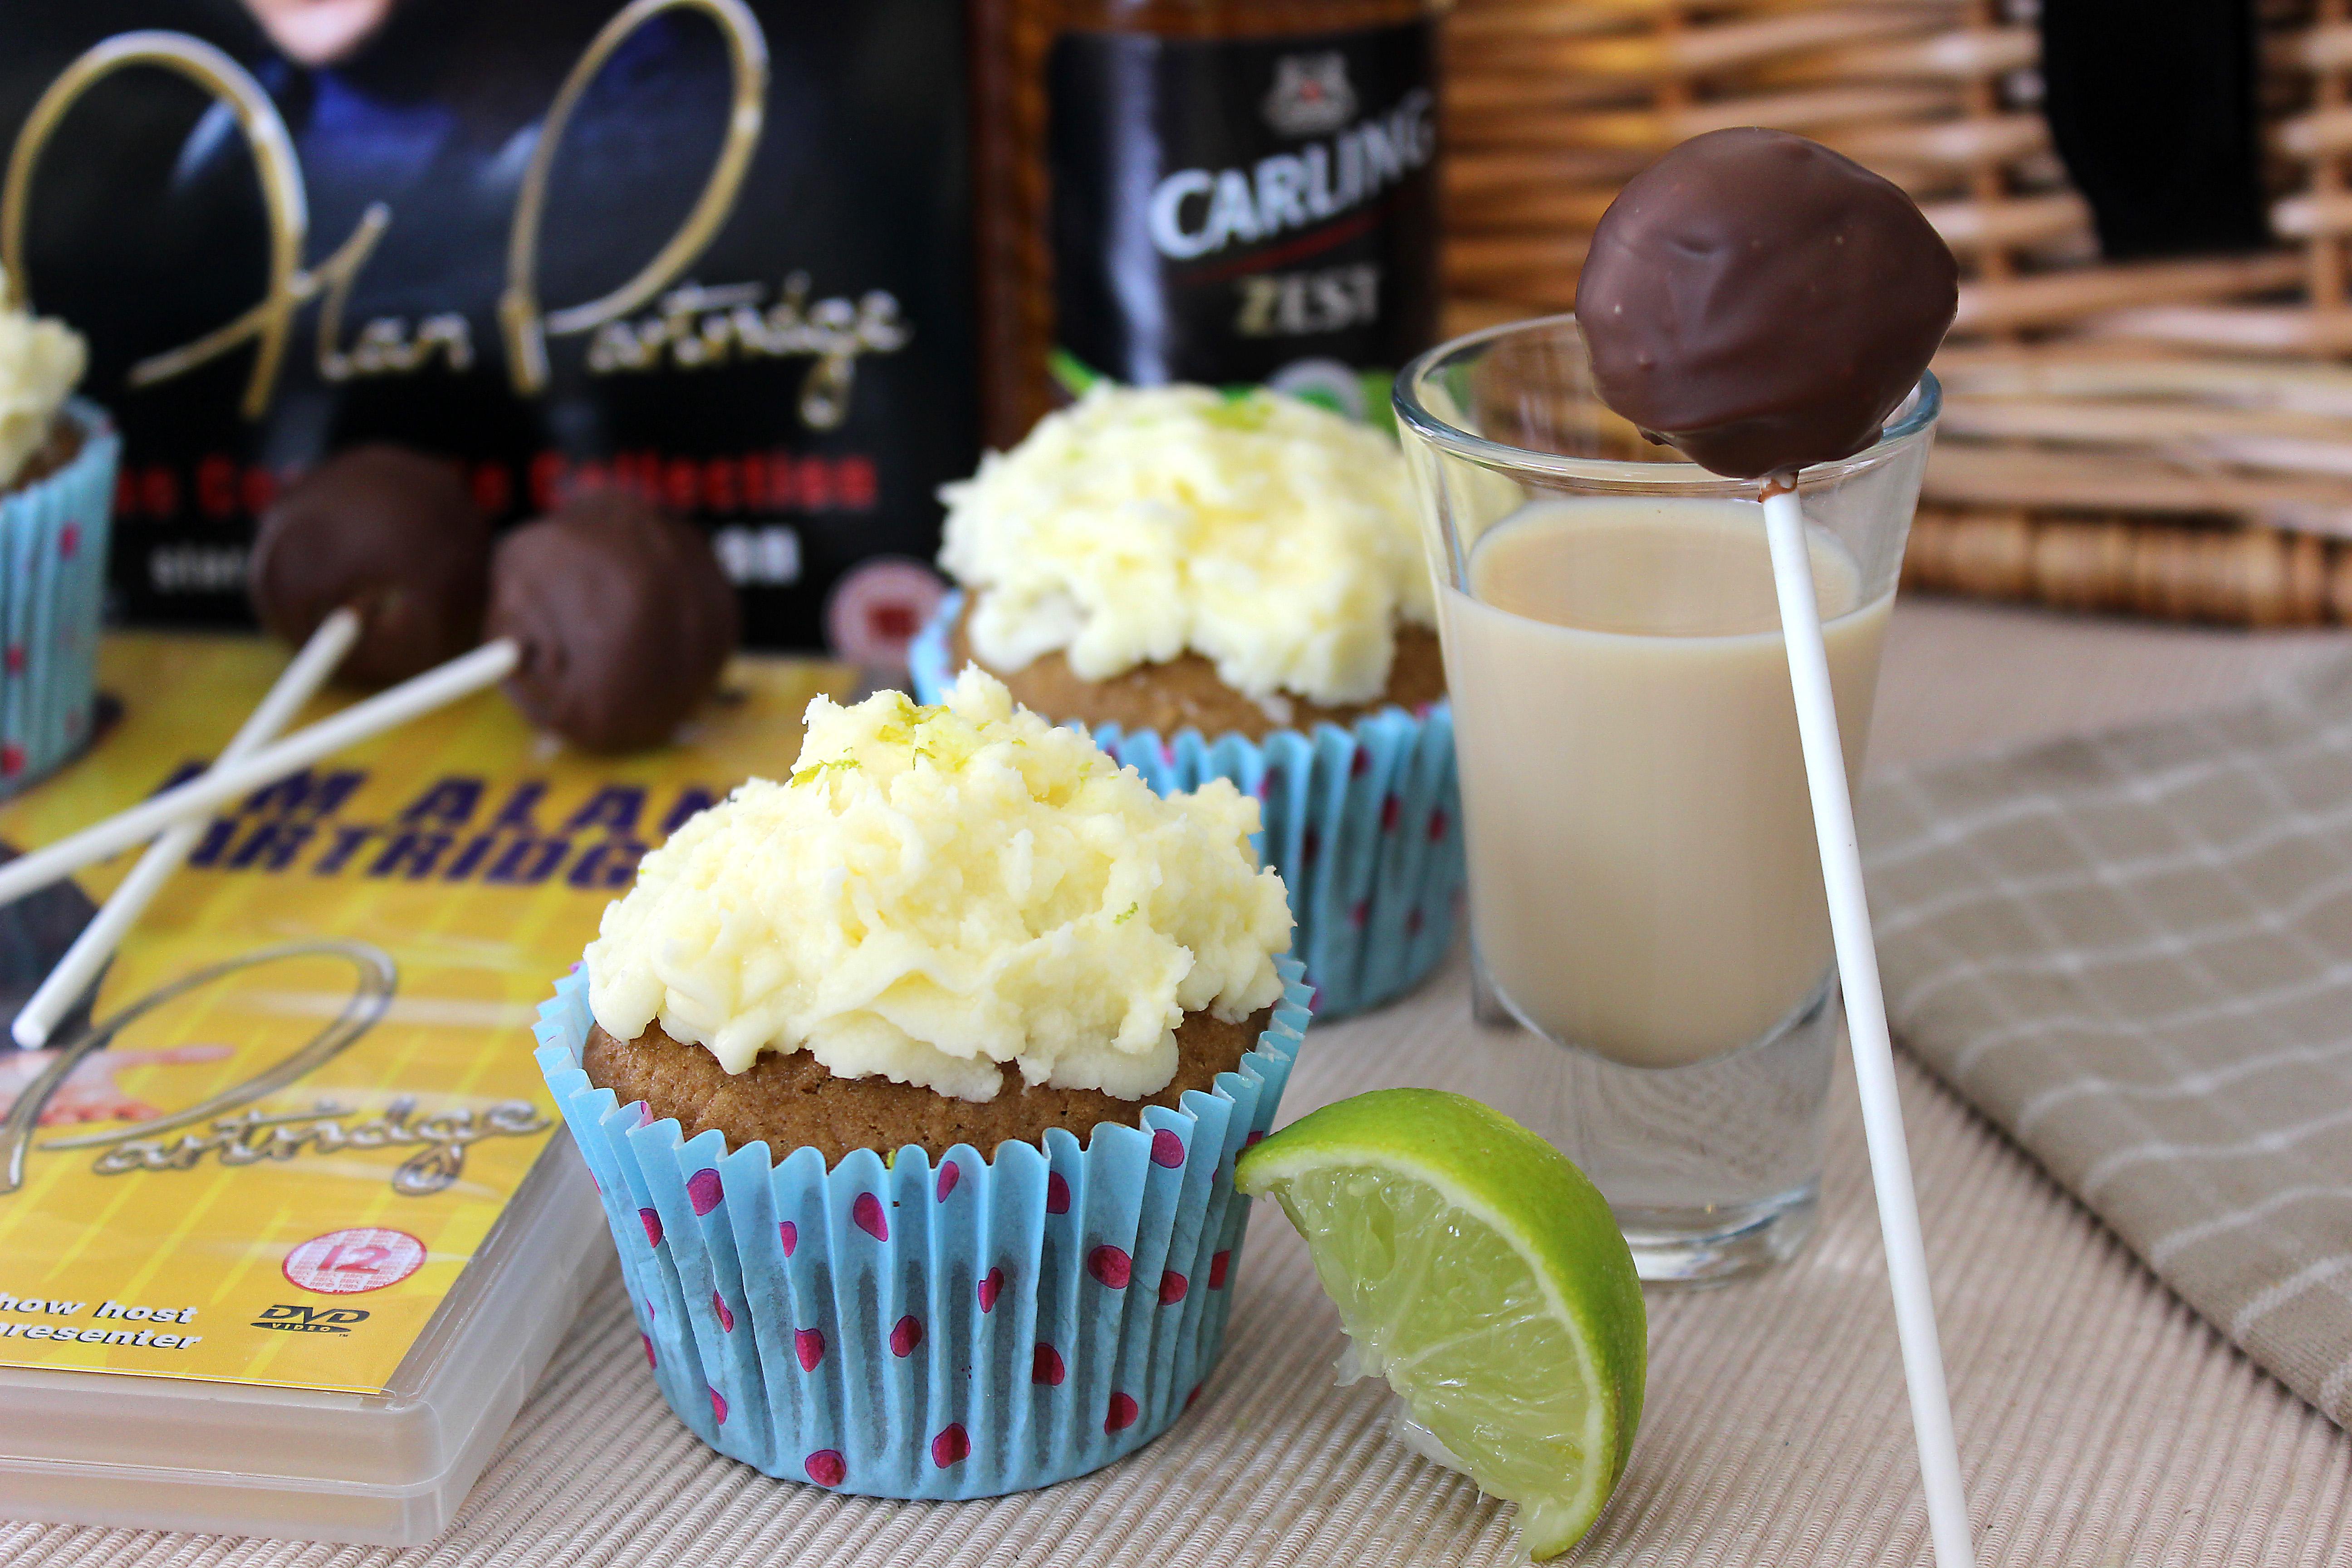 Alan Partridge Ladyboy Cupcakes